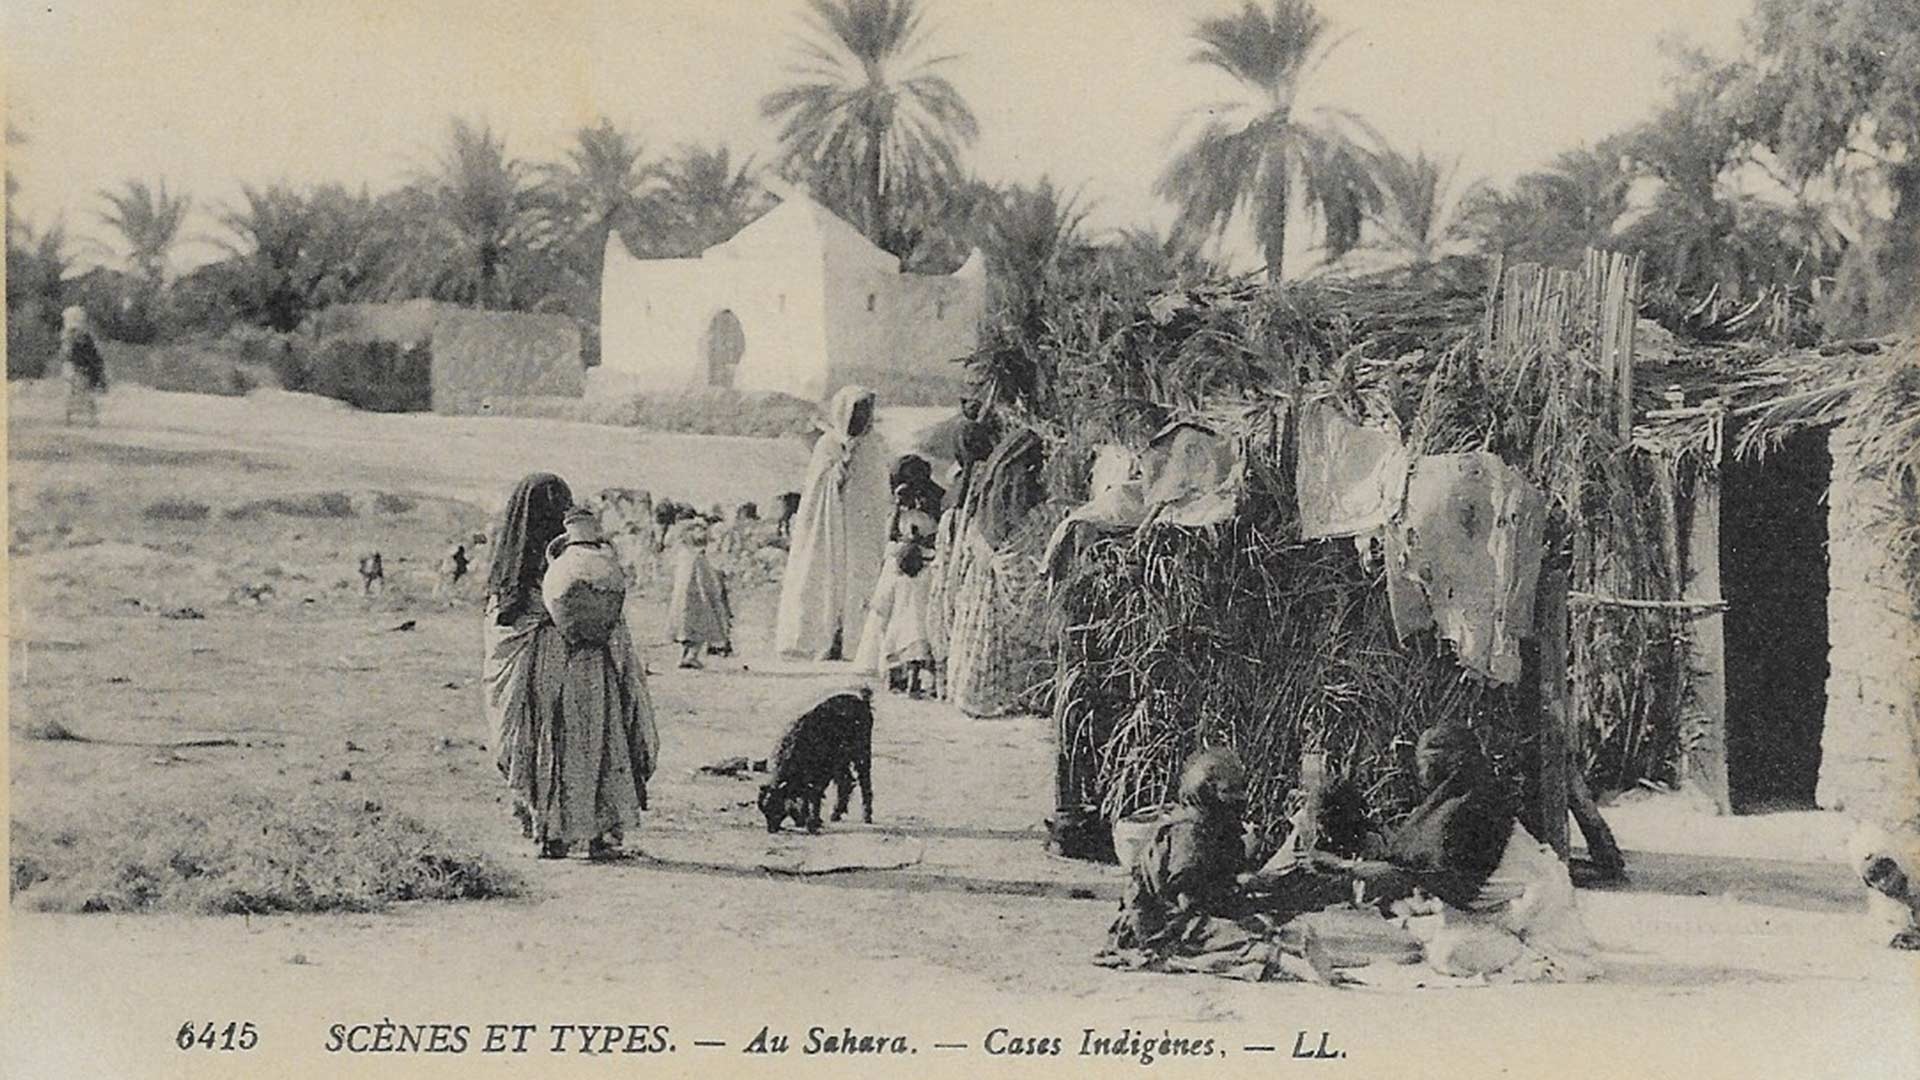 sahara-cases-indigenes